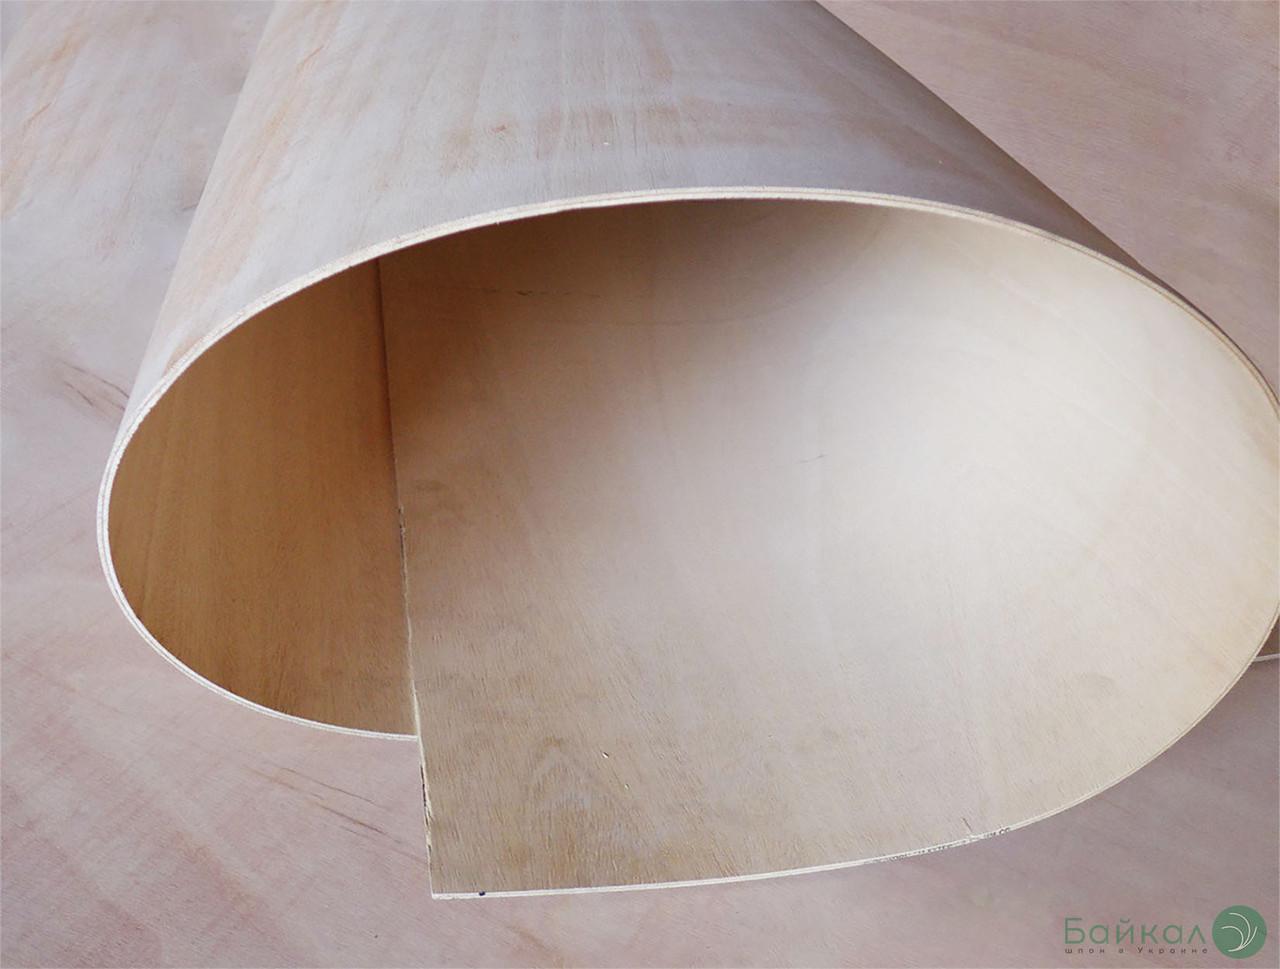 Фанера сейба гнучка 8 мм - 2,44х1,22 м (Поздовжня / Long)